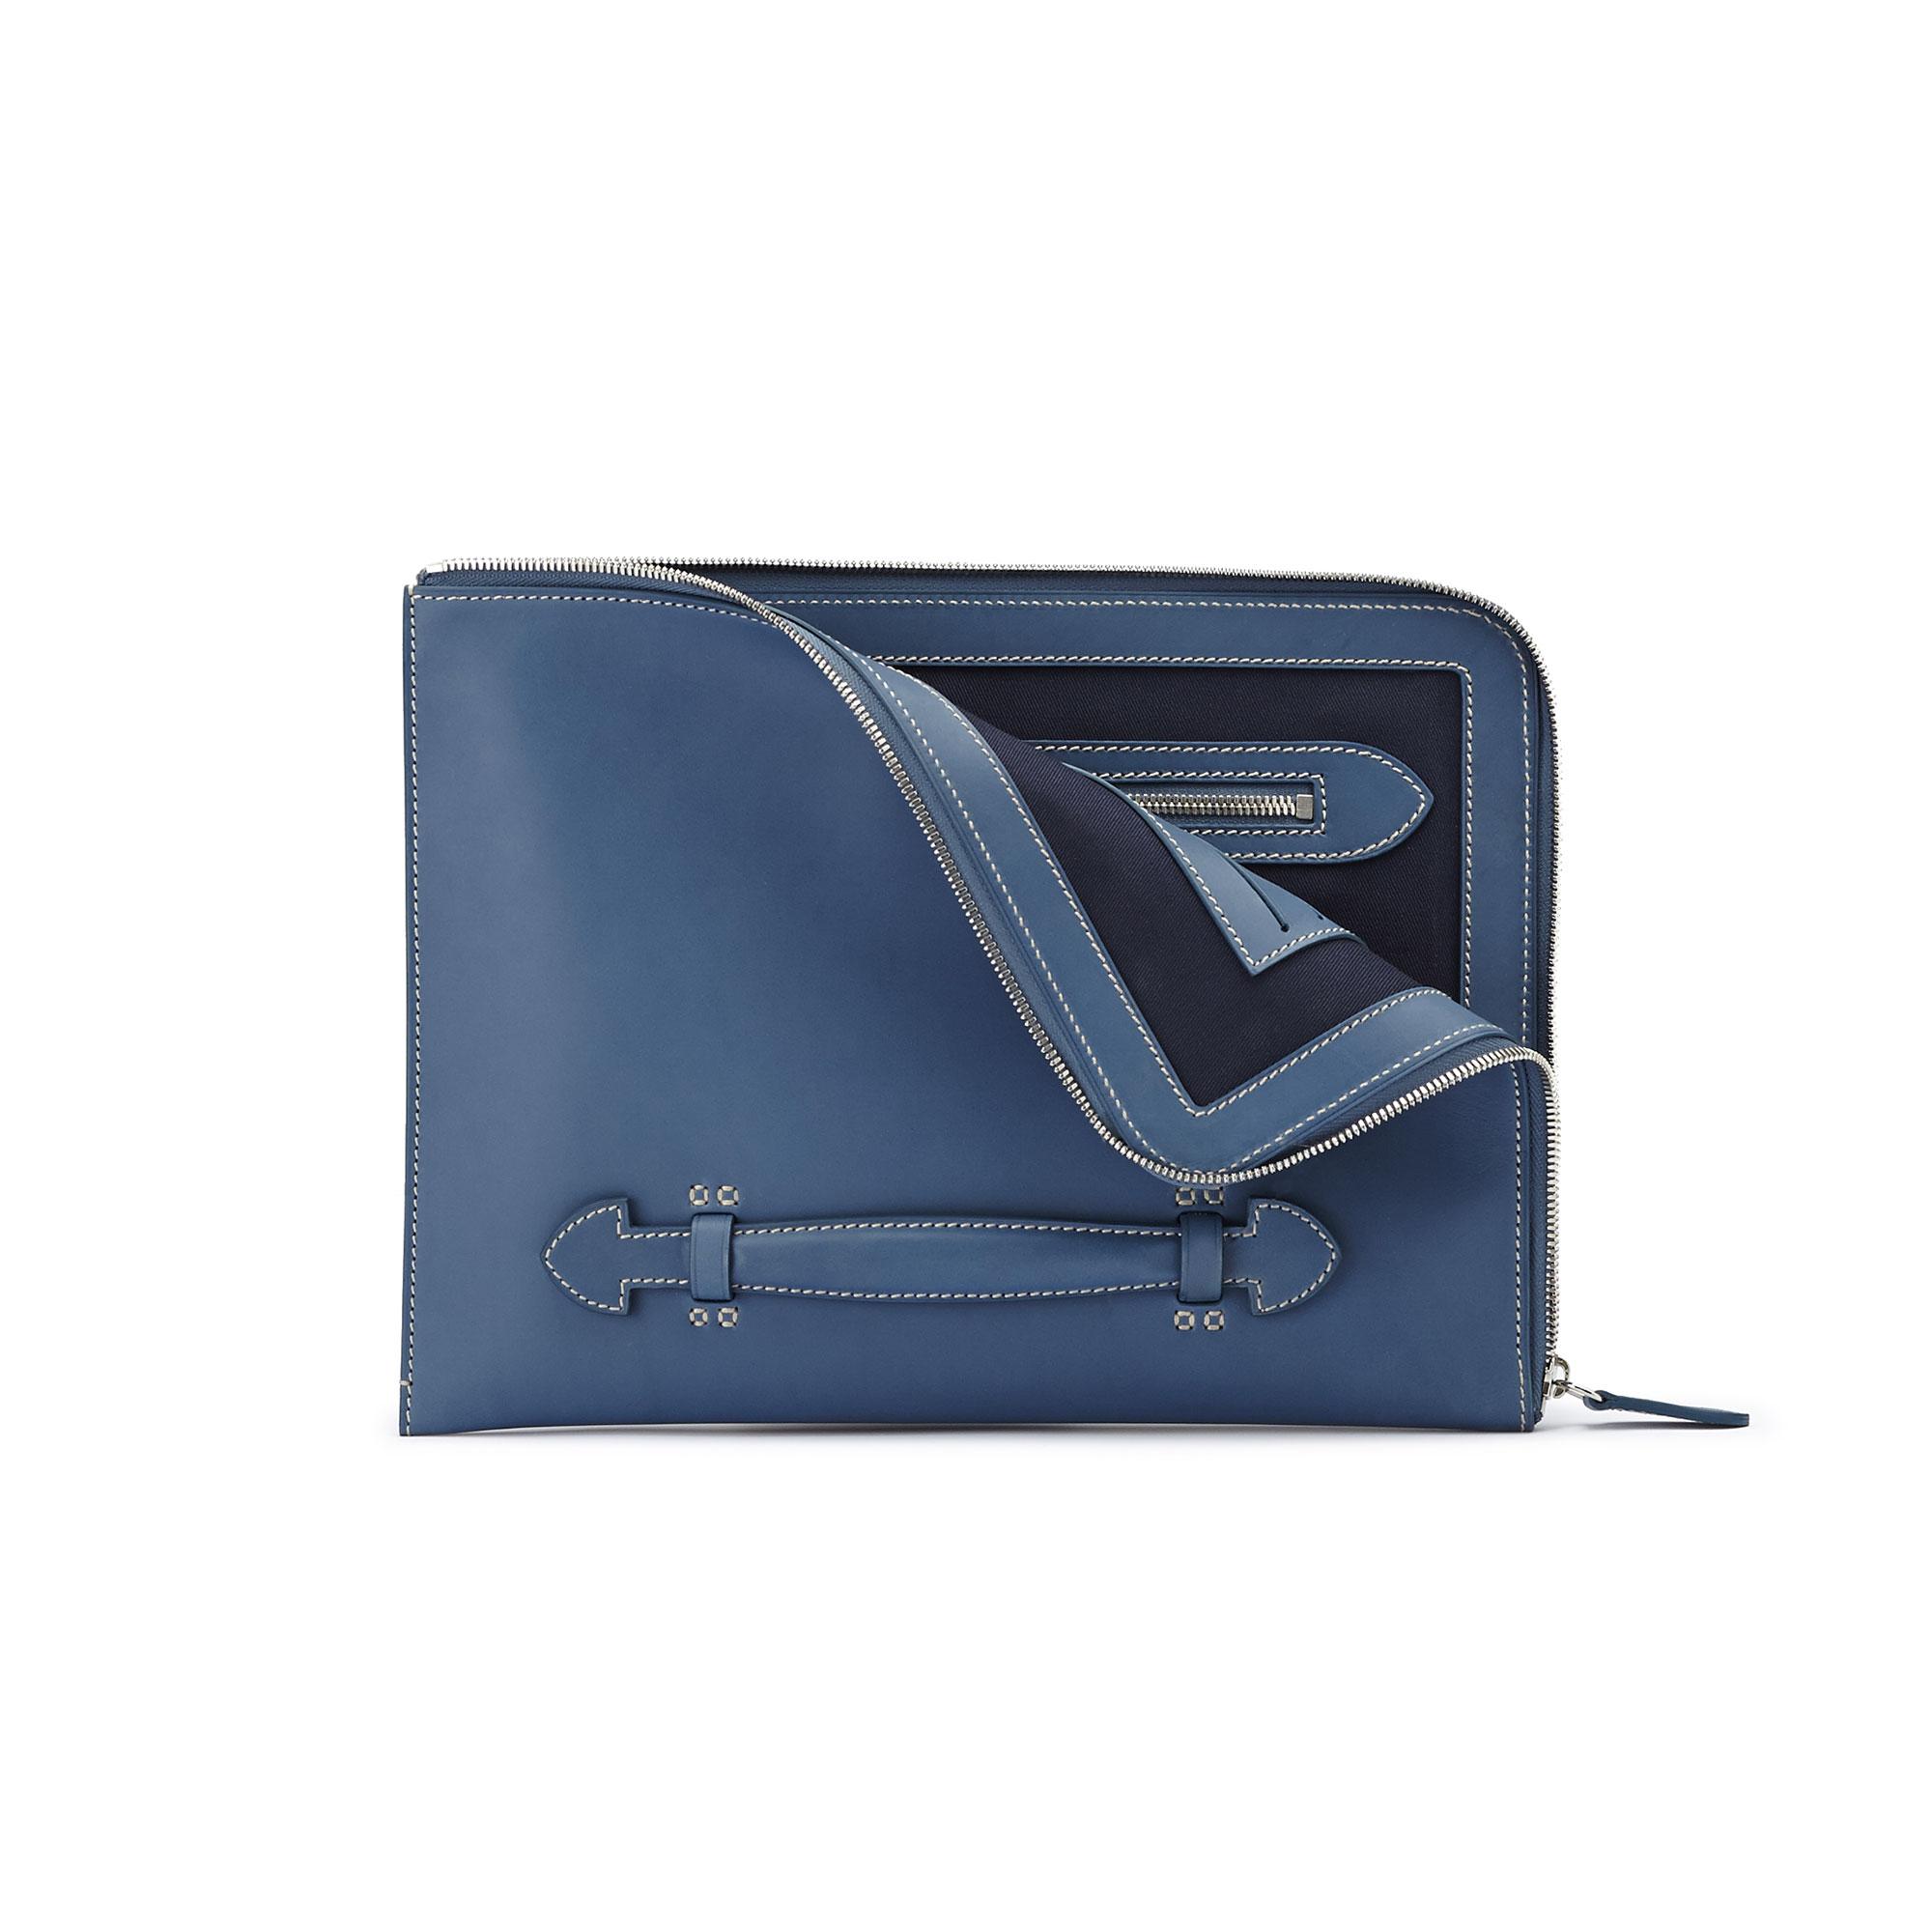 The blue french calf Handle Zip Folio 33 by Bertoni 1949 02